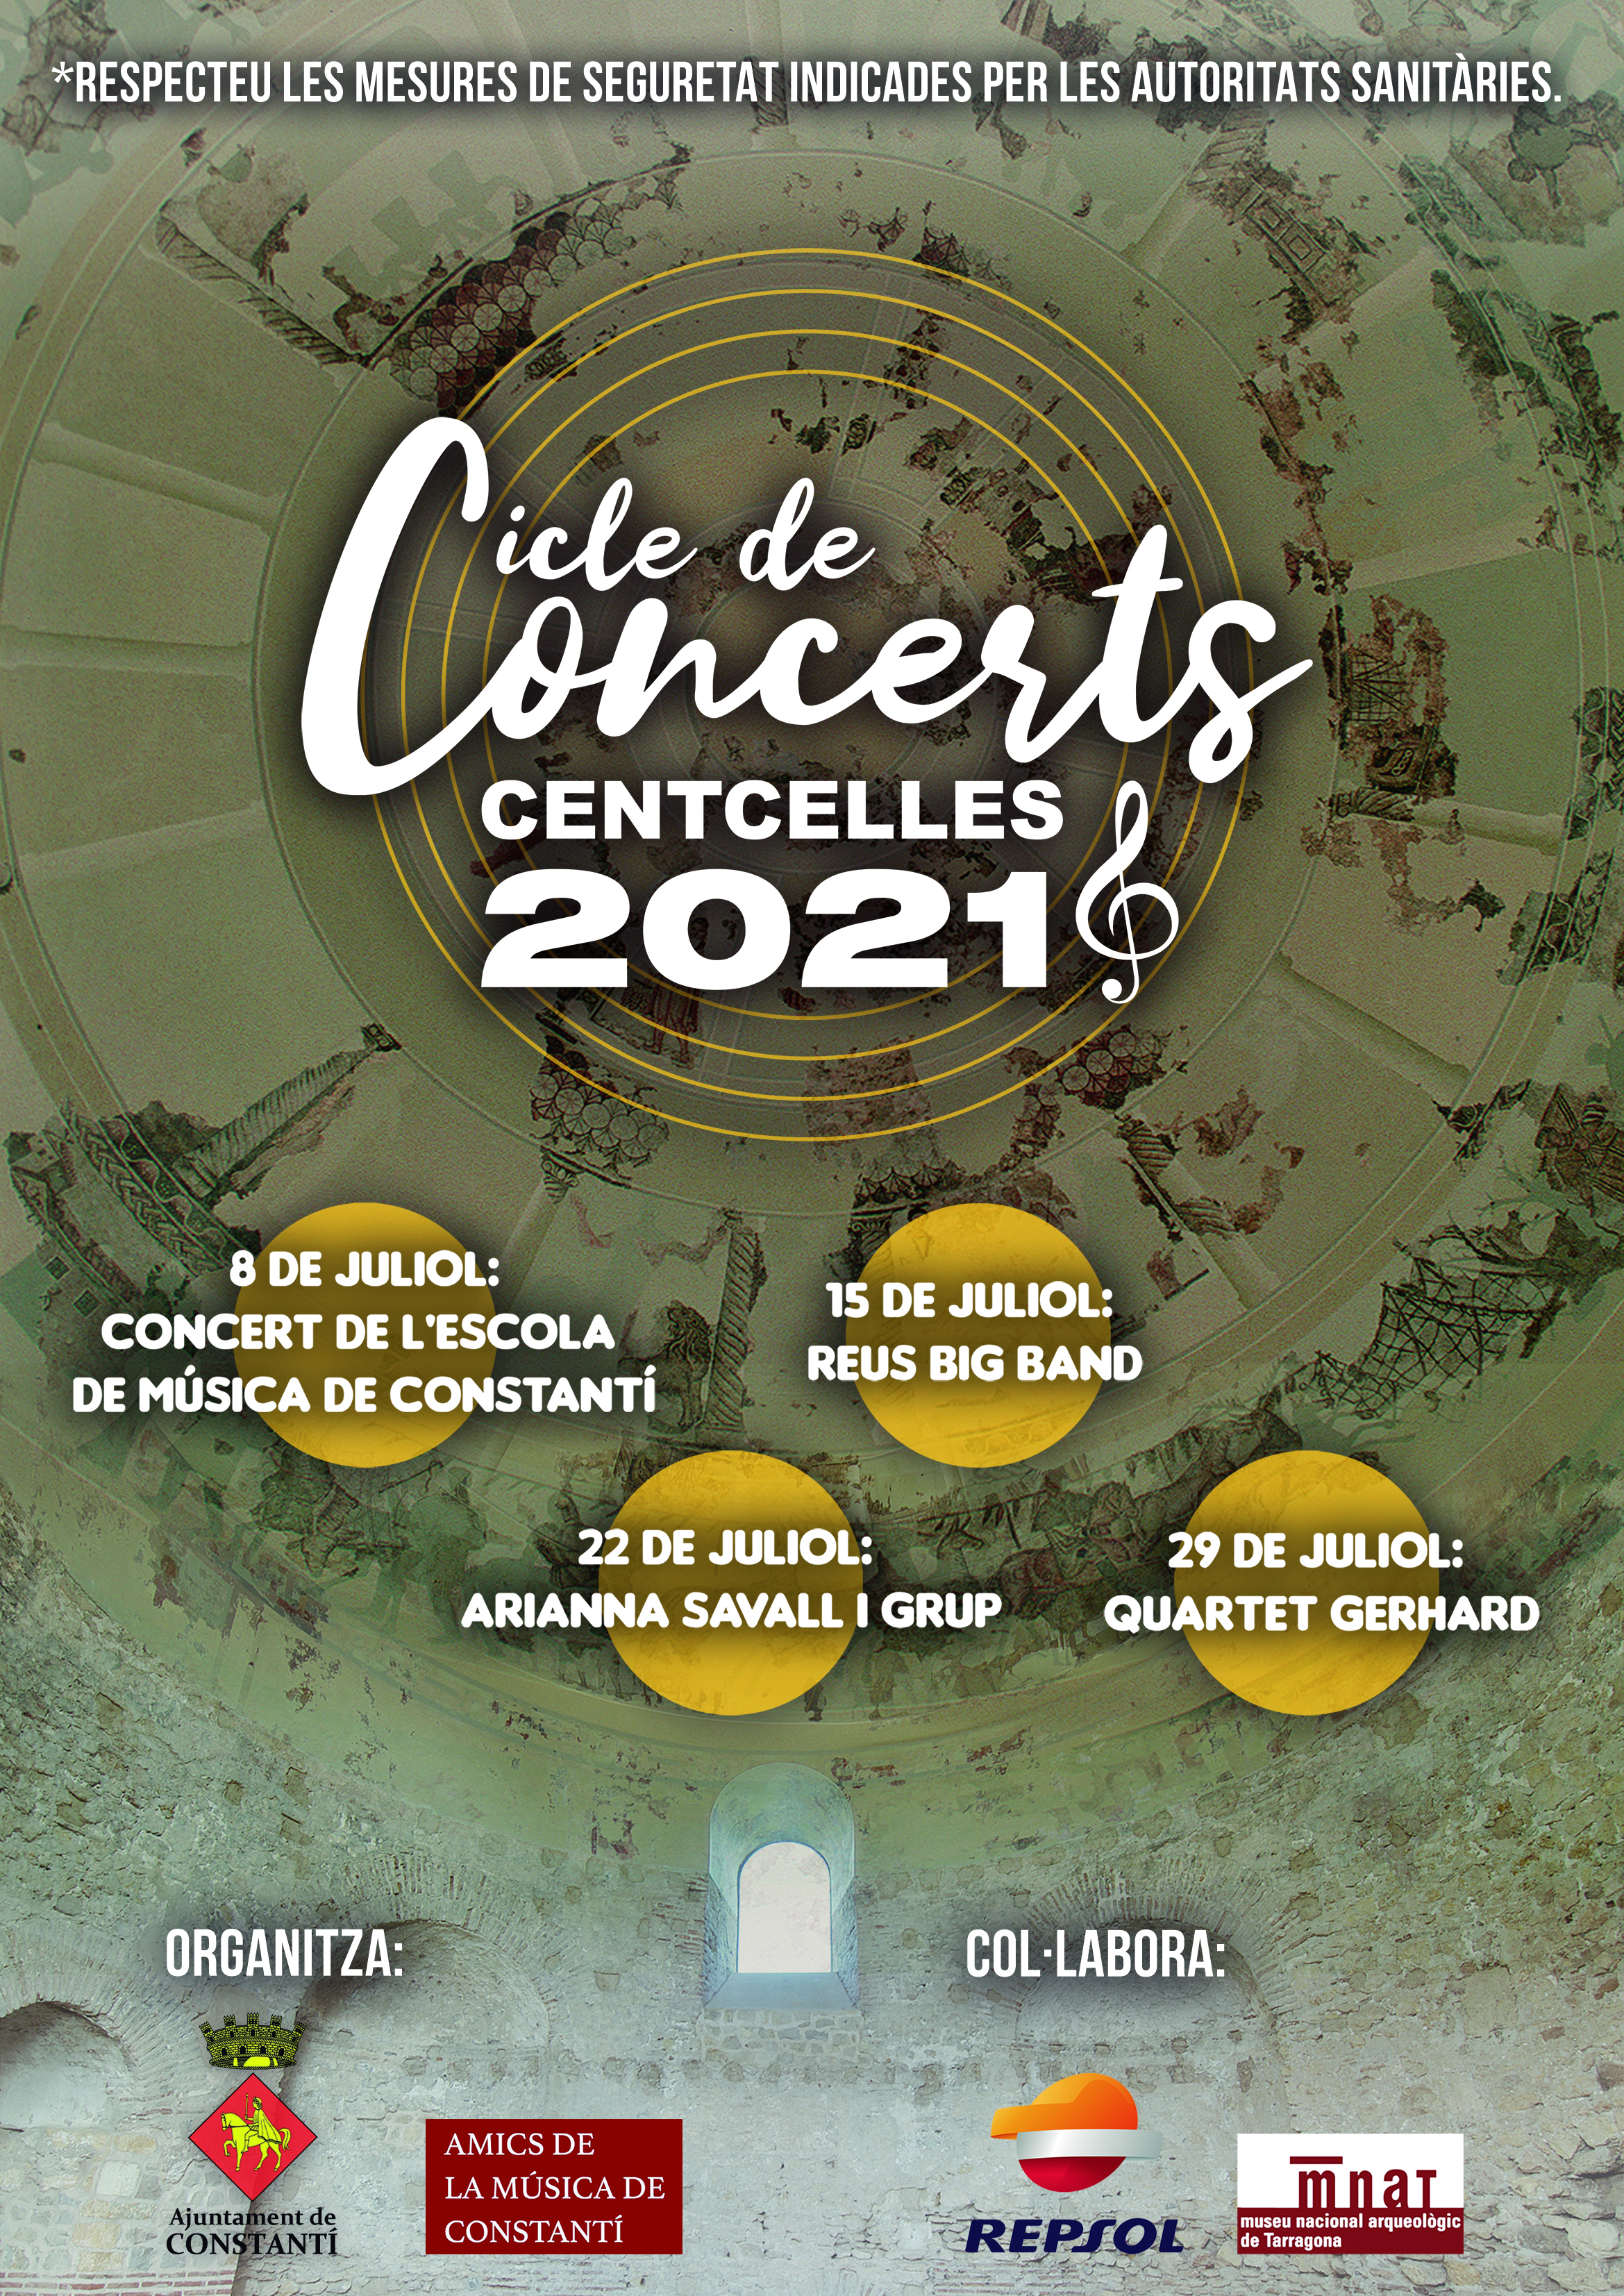 Cicle de Concerts Centcelles 2021 – Ajuntament de Constantí